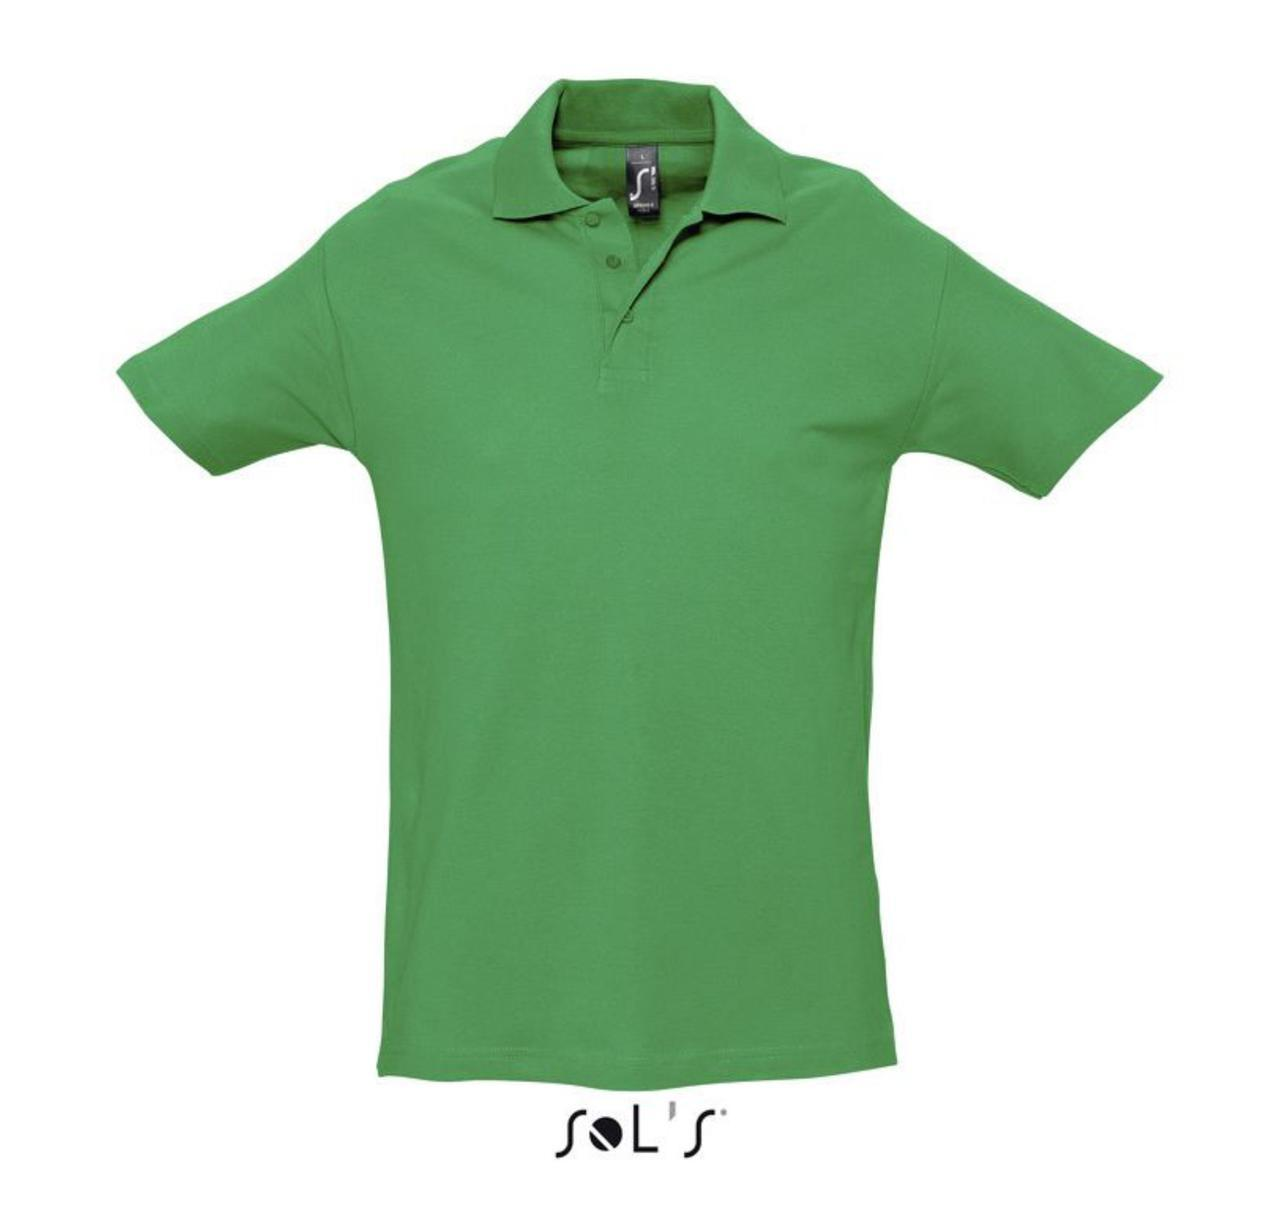 Рубашка поло SPRING II, цвет Kelly green, размер M